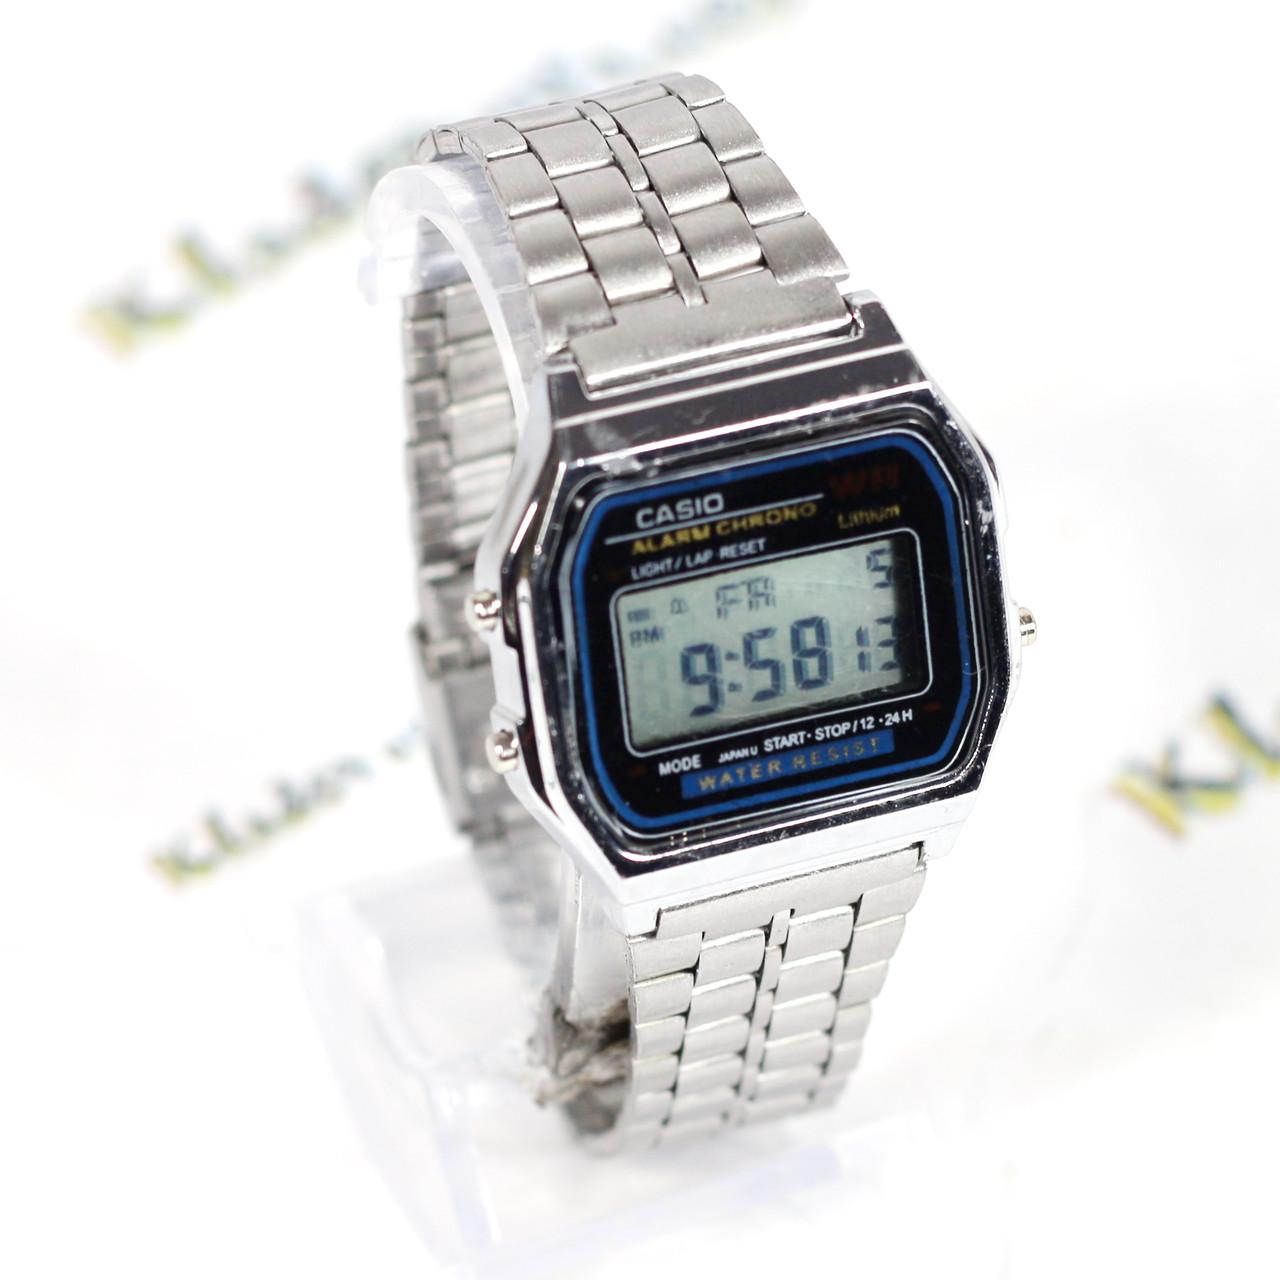 00592b94 Ретро Электронные часы Casio A159W - Интернет-магазин